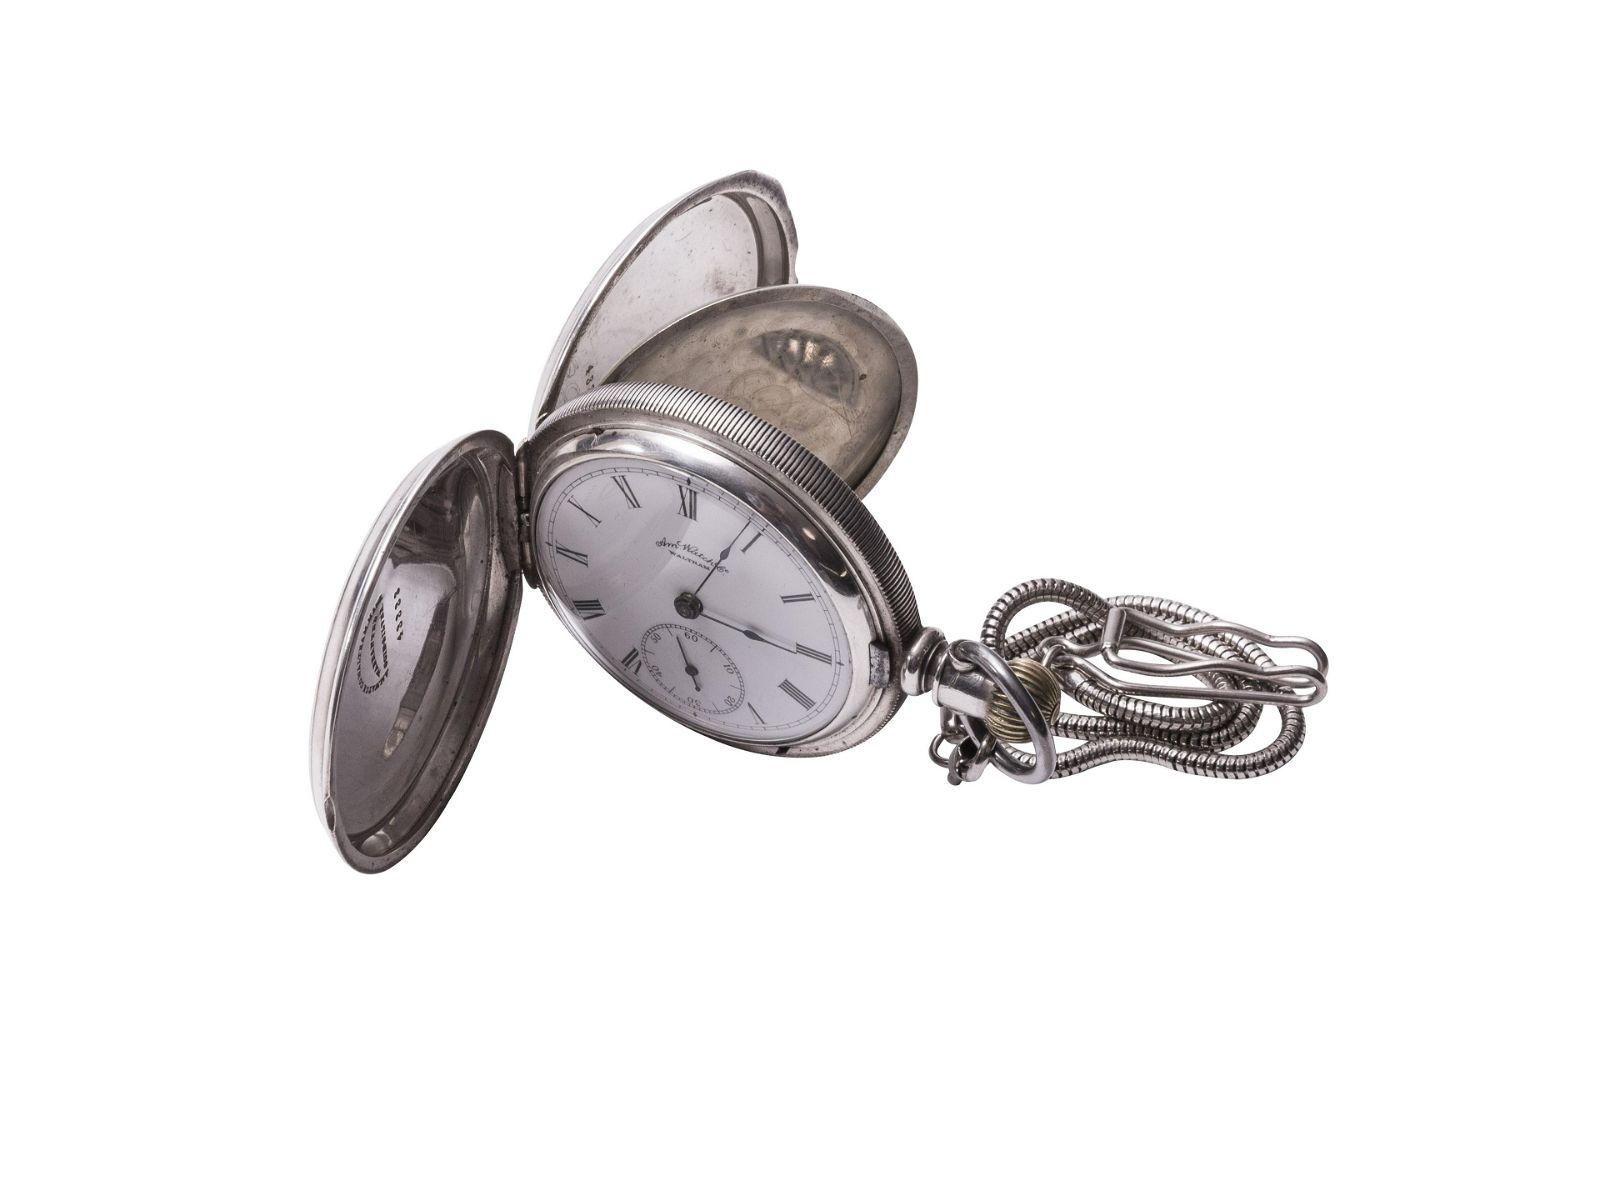 Antique American Watch Co. Pocket Watch